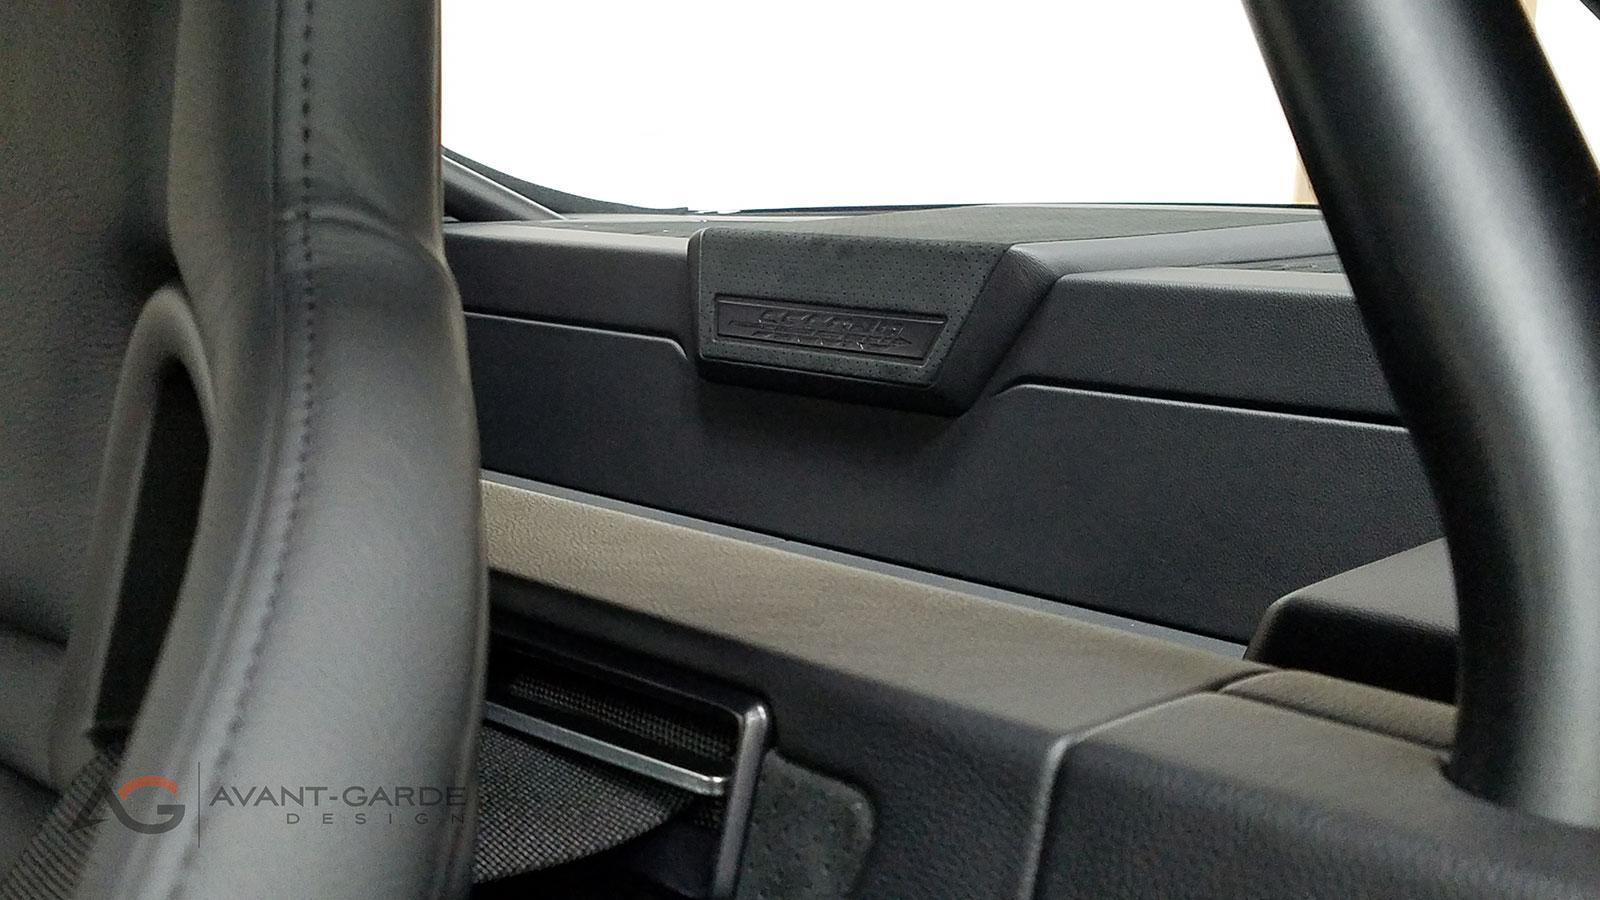 interior-rear-area